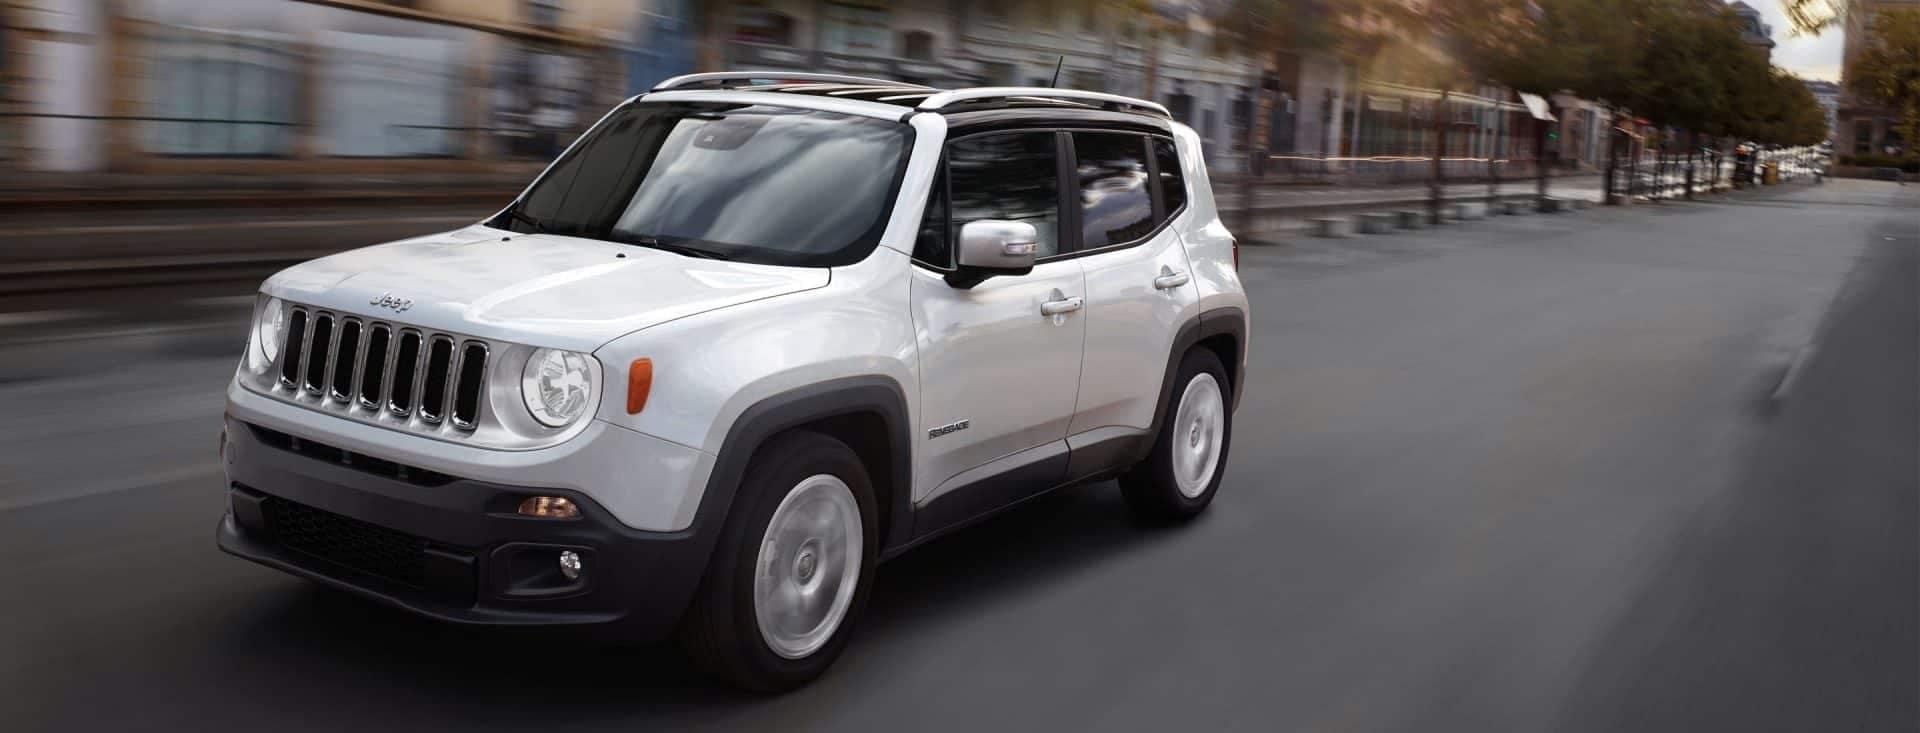 Jeep Renegade Dealership